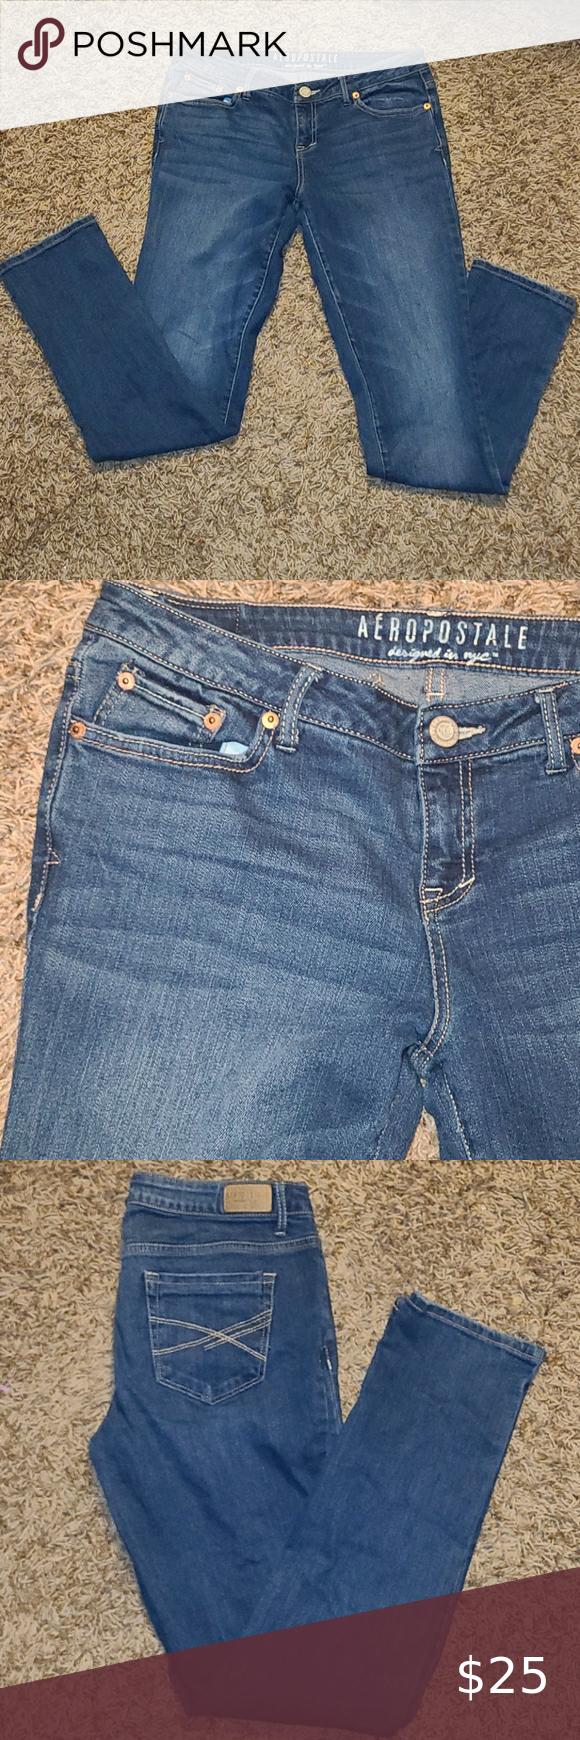 Aeropostale Skinny Blue Jeans Excellent Used Condition Aeropostale Jeans Skinny